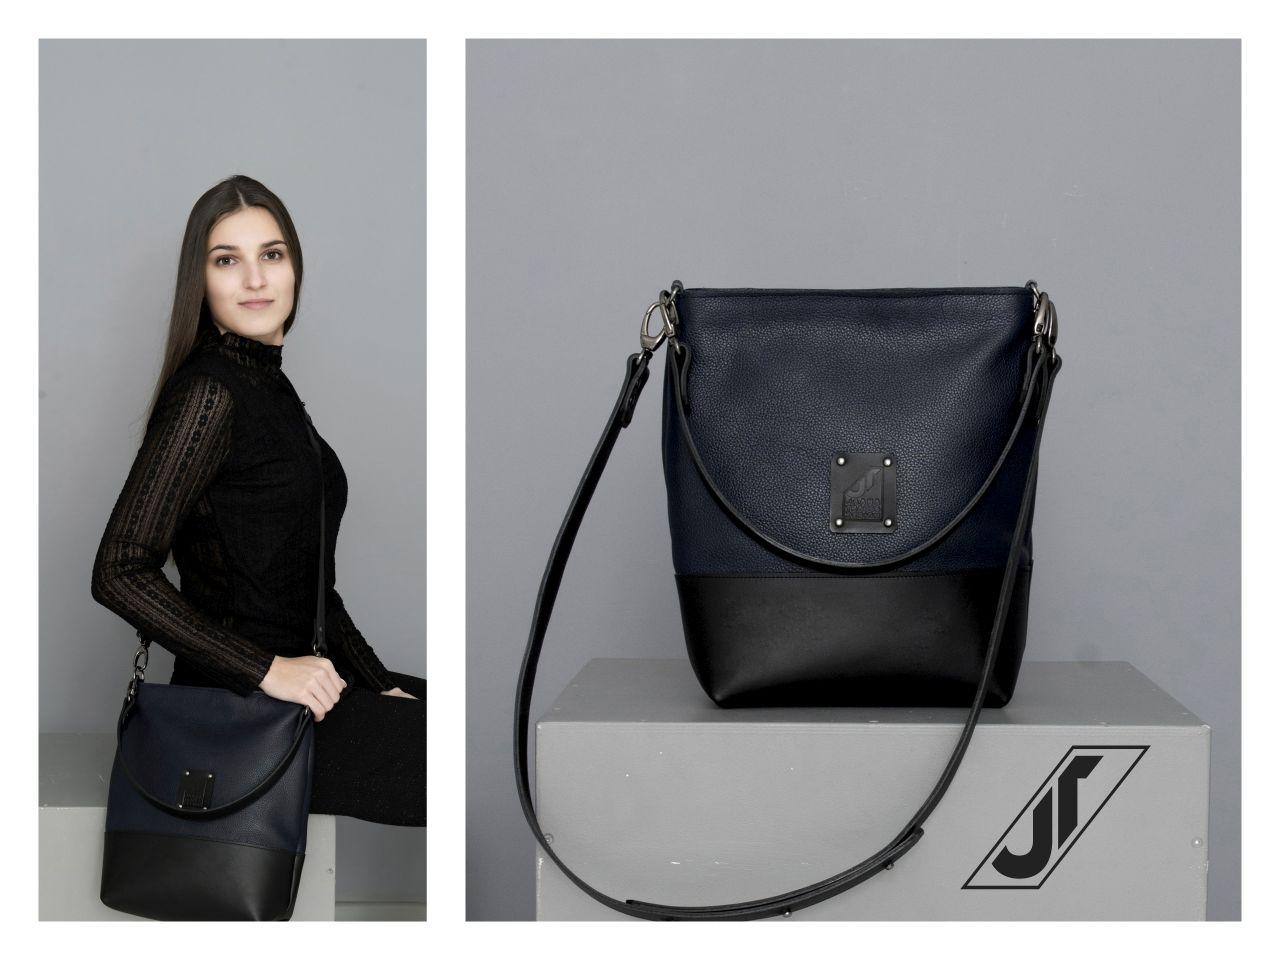 11 - Jaana Trauss Design käsitööna valmivad nahkkotid ja -ehted